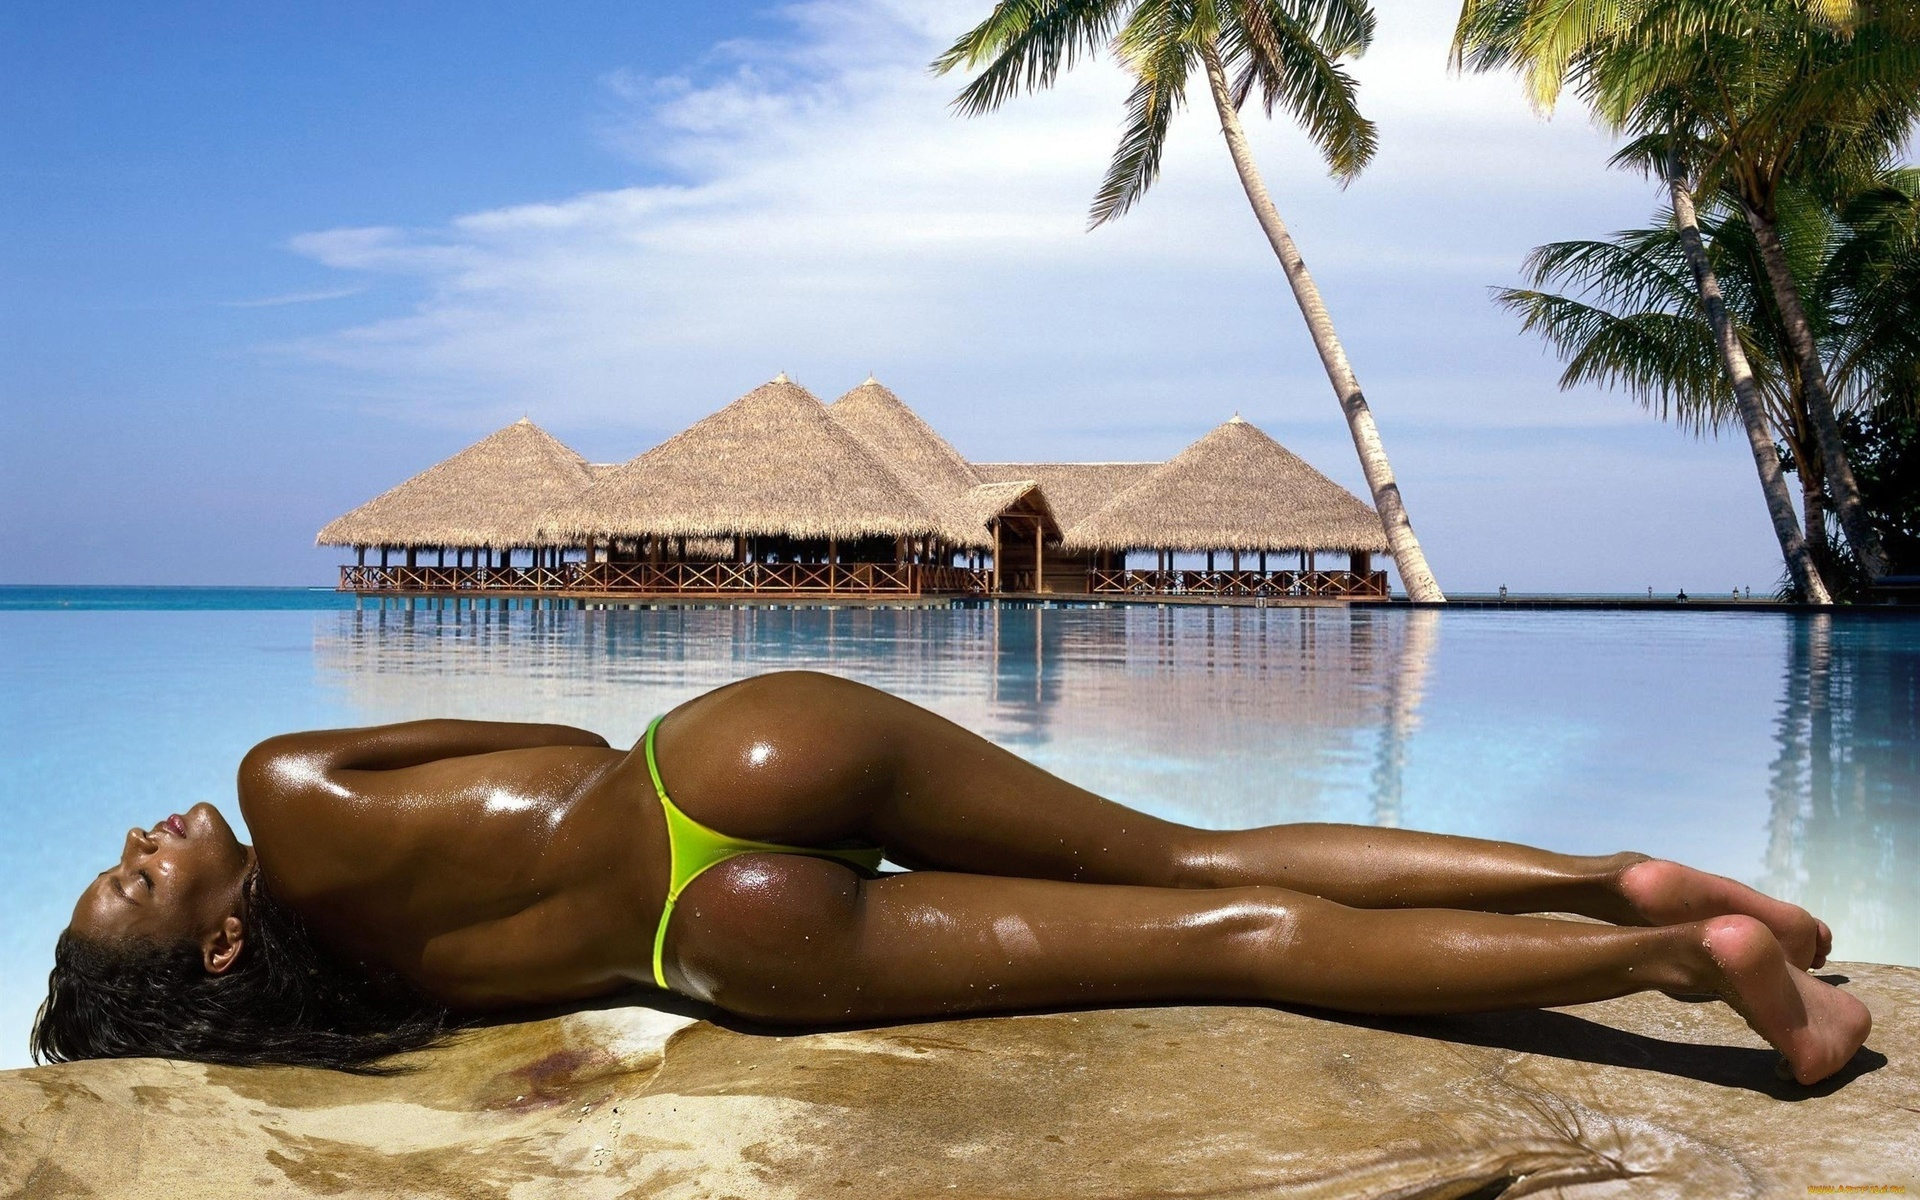 Фото африканок без купальников, Африканка загорает на шезлонге без бикини 27 фотография